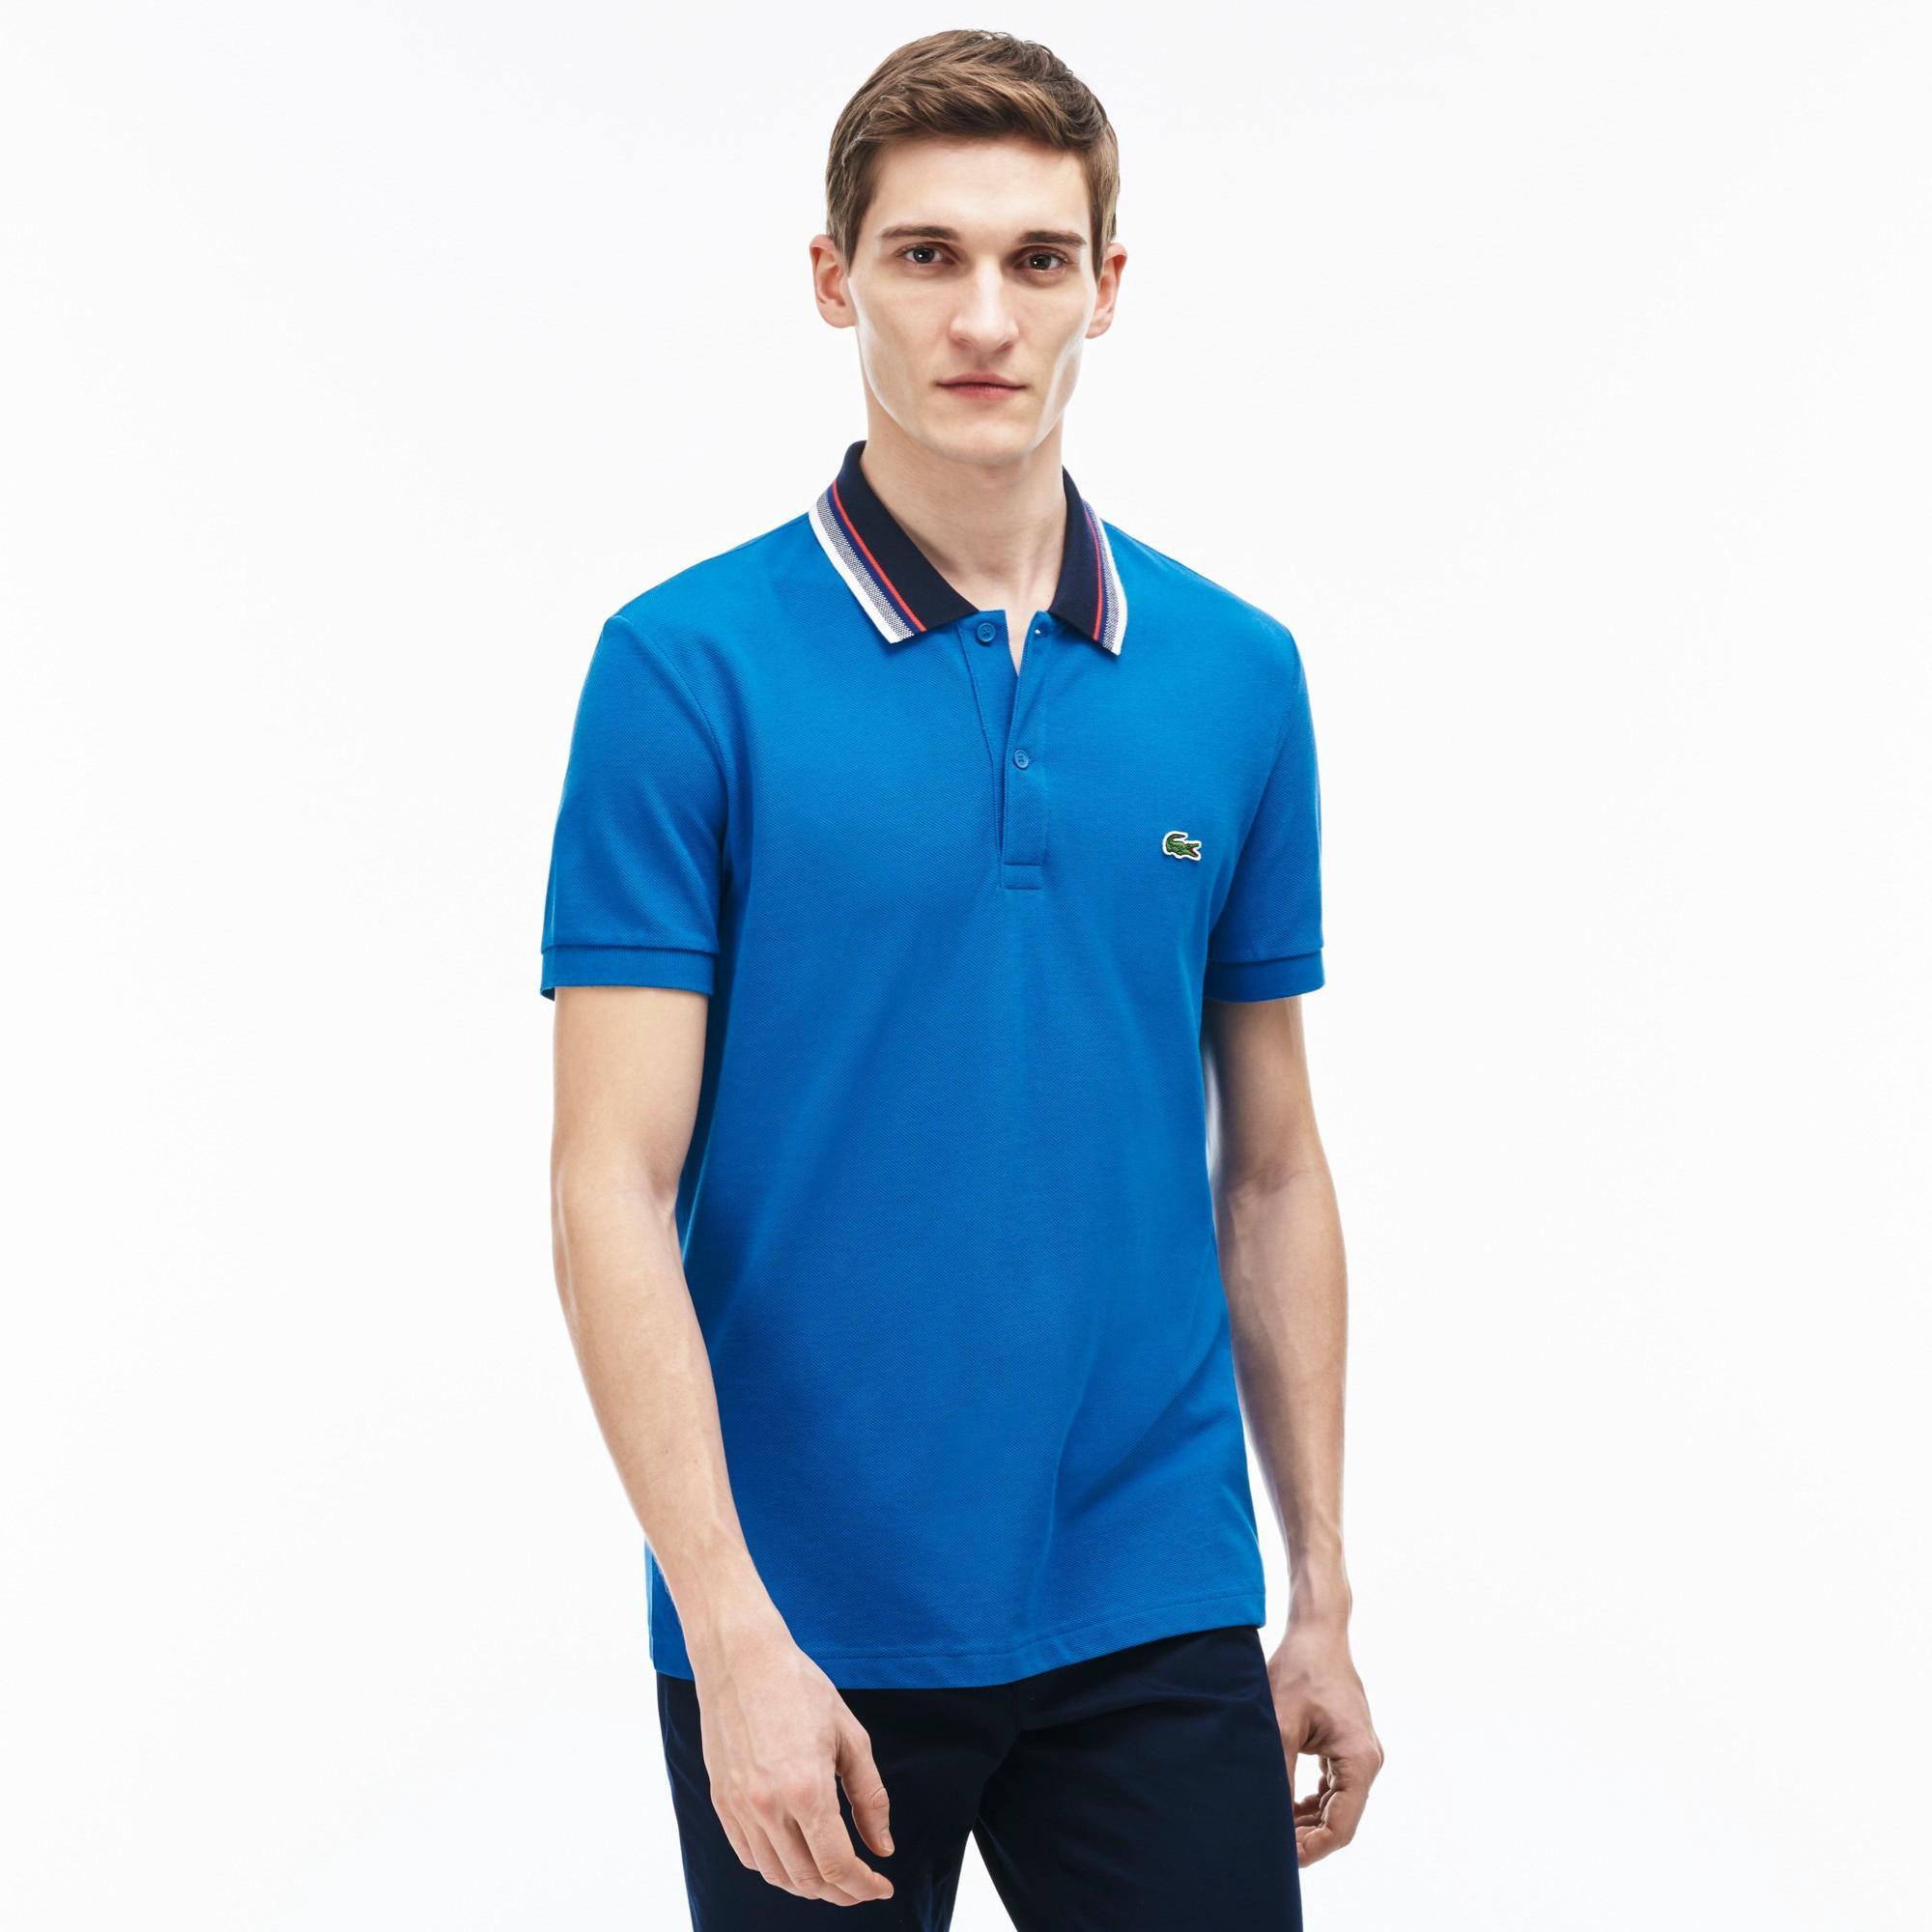 a0a7f9b2 Lacoste Men's Regular Fit Petit PiquÉ Striped Collar Polo Shirt - Sapphire  Blue